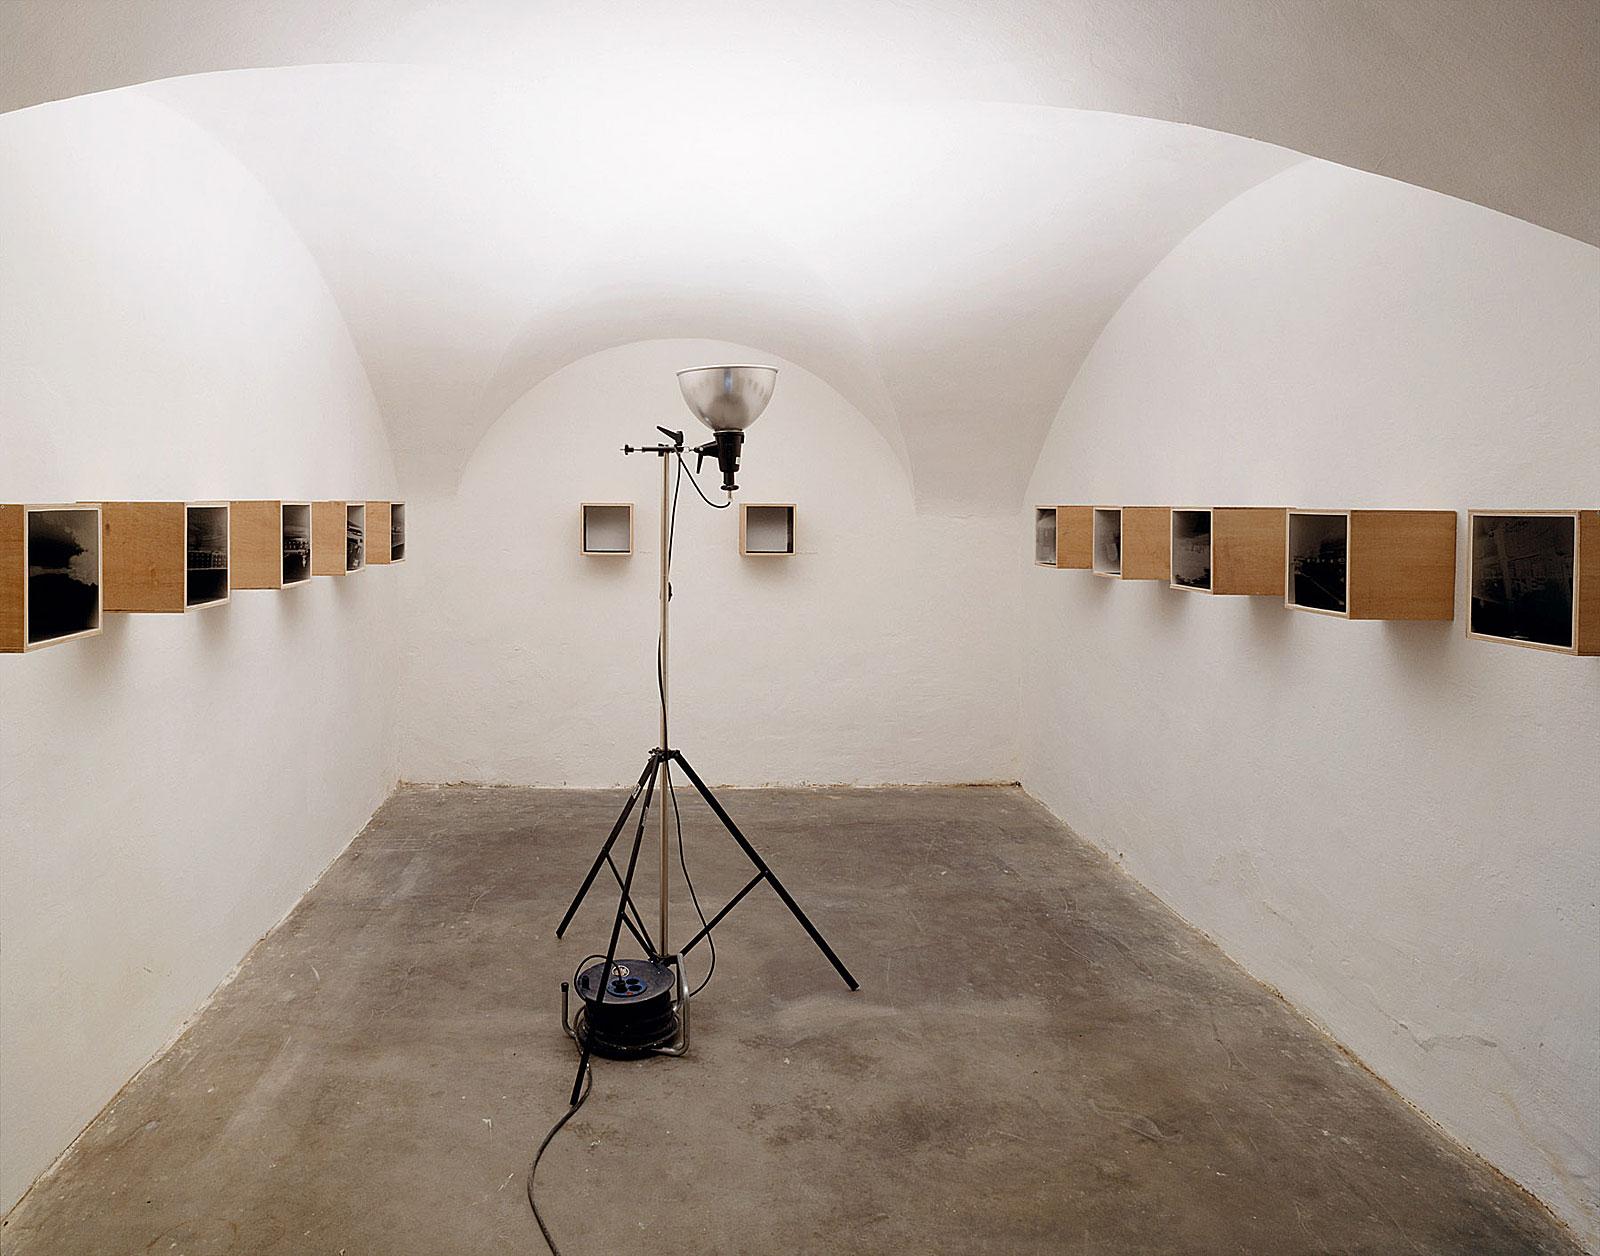 Camera Controversa, Firmian-Salm-Haus, Salzburg 1990